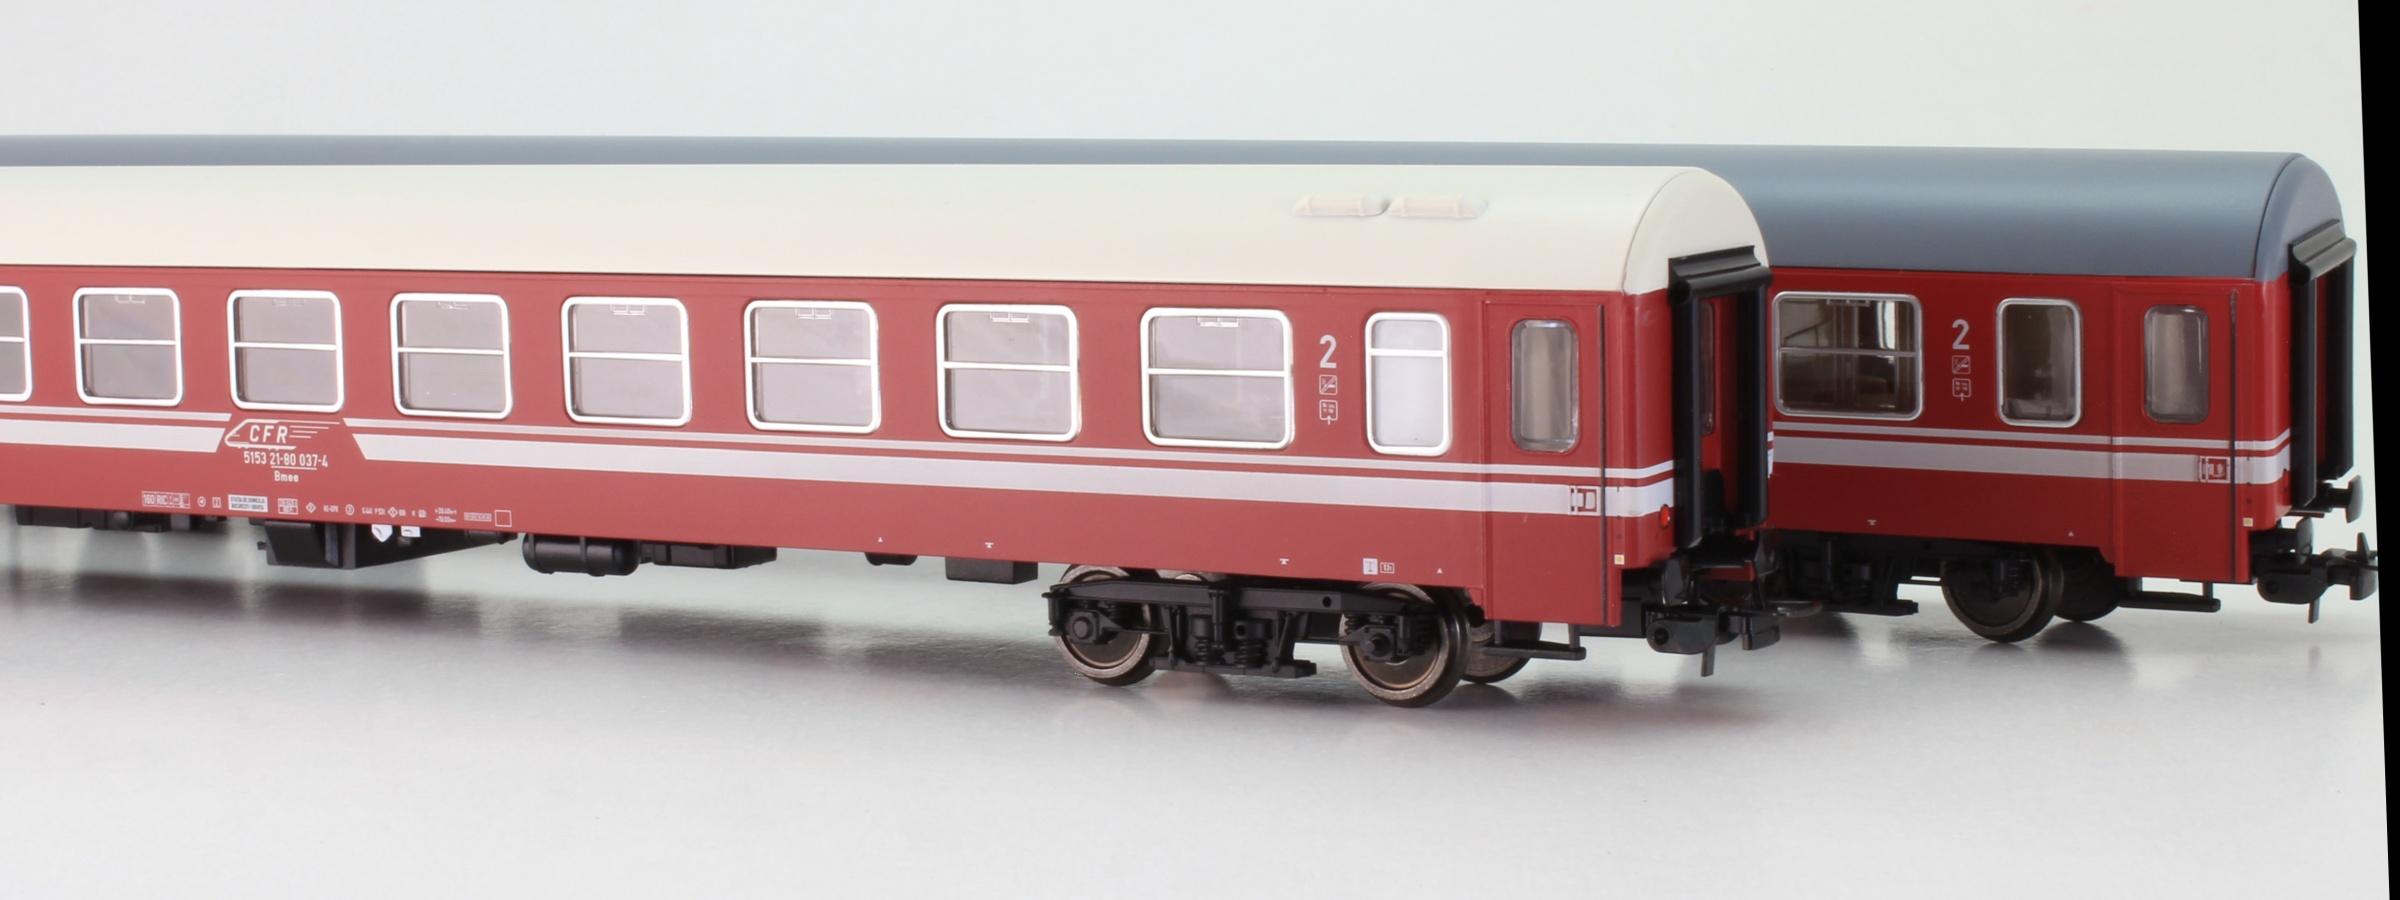 https://www.trains-addicted.ro/Resources/52530395/%5Eall/vagoane-calatori-dwa-cfr-clasa-2-tillig-501992.jpg